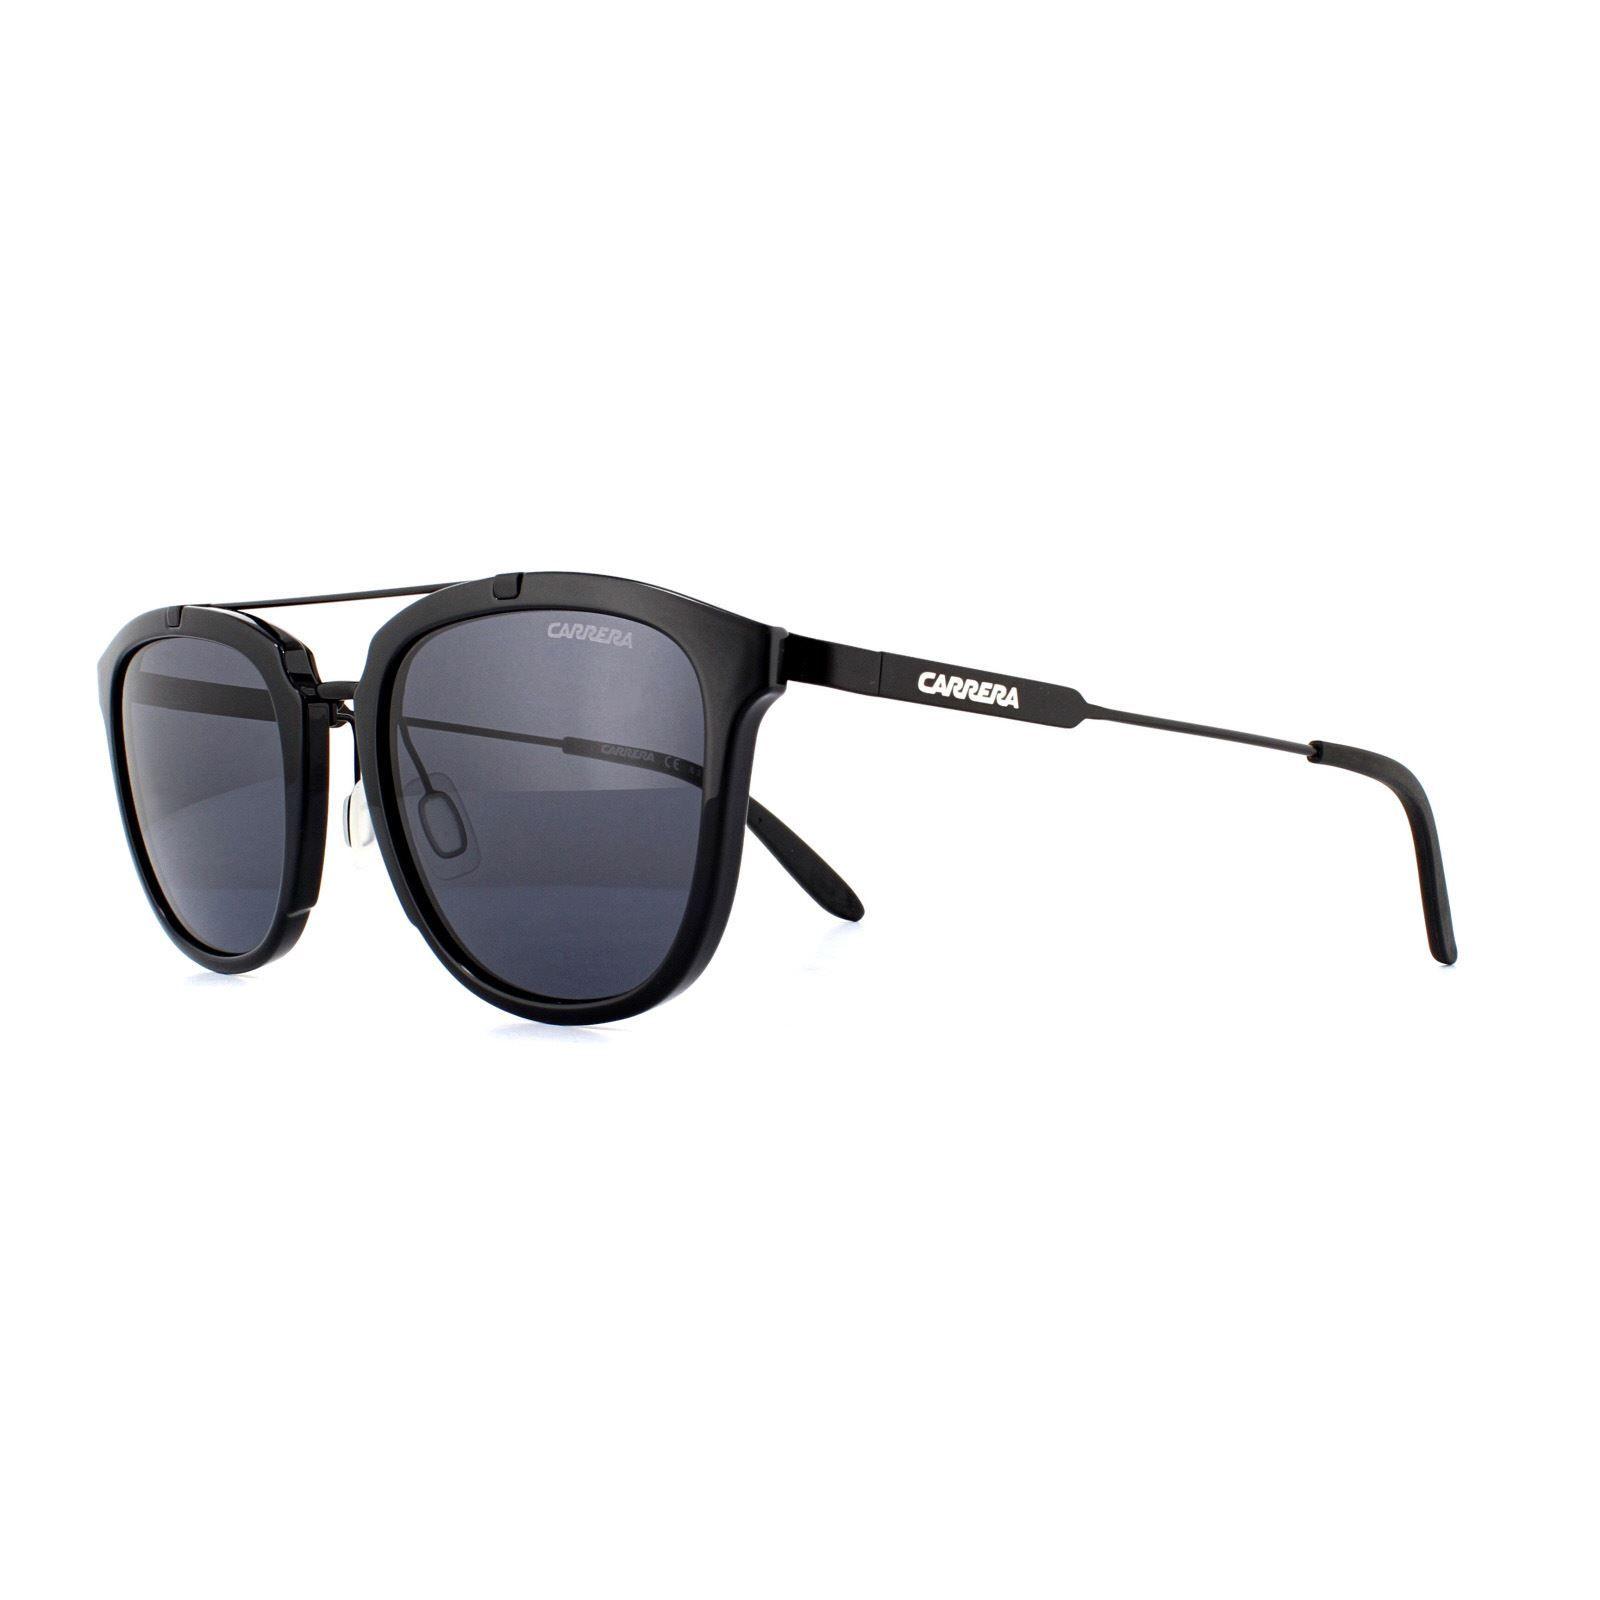 Carrera Sunglasses Carrera 127 GVB IR Black Grey